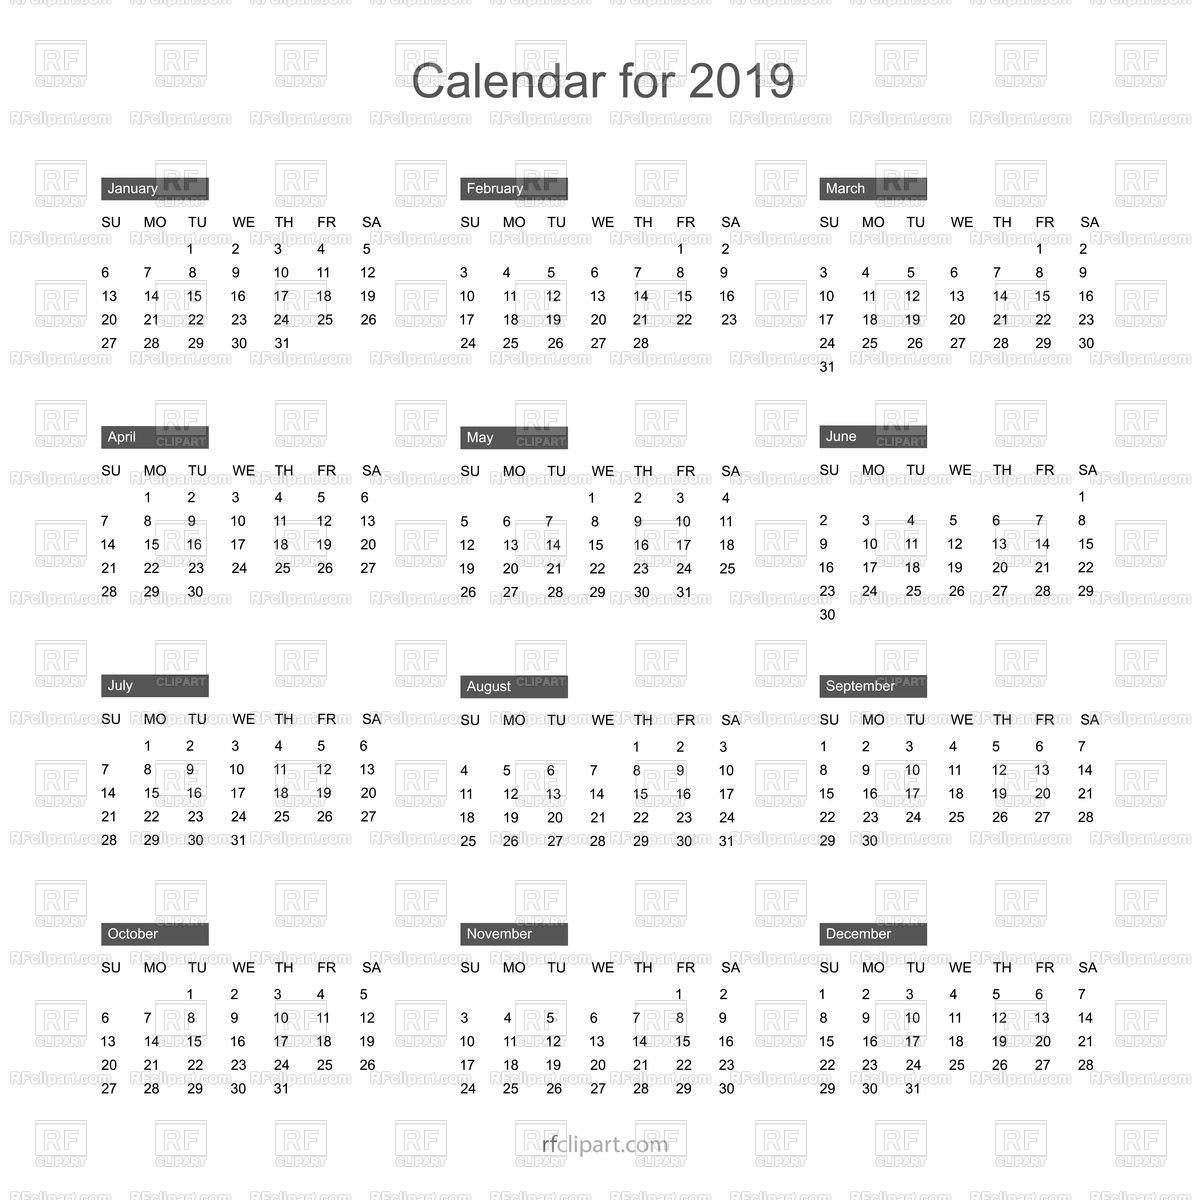 Free Calendar 2019 Layout Free Vector Image – Vector Artwork Of Calendar 2019 Clipart